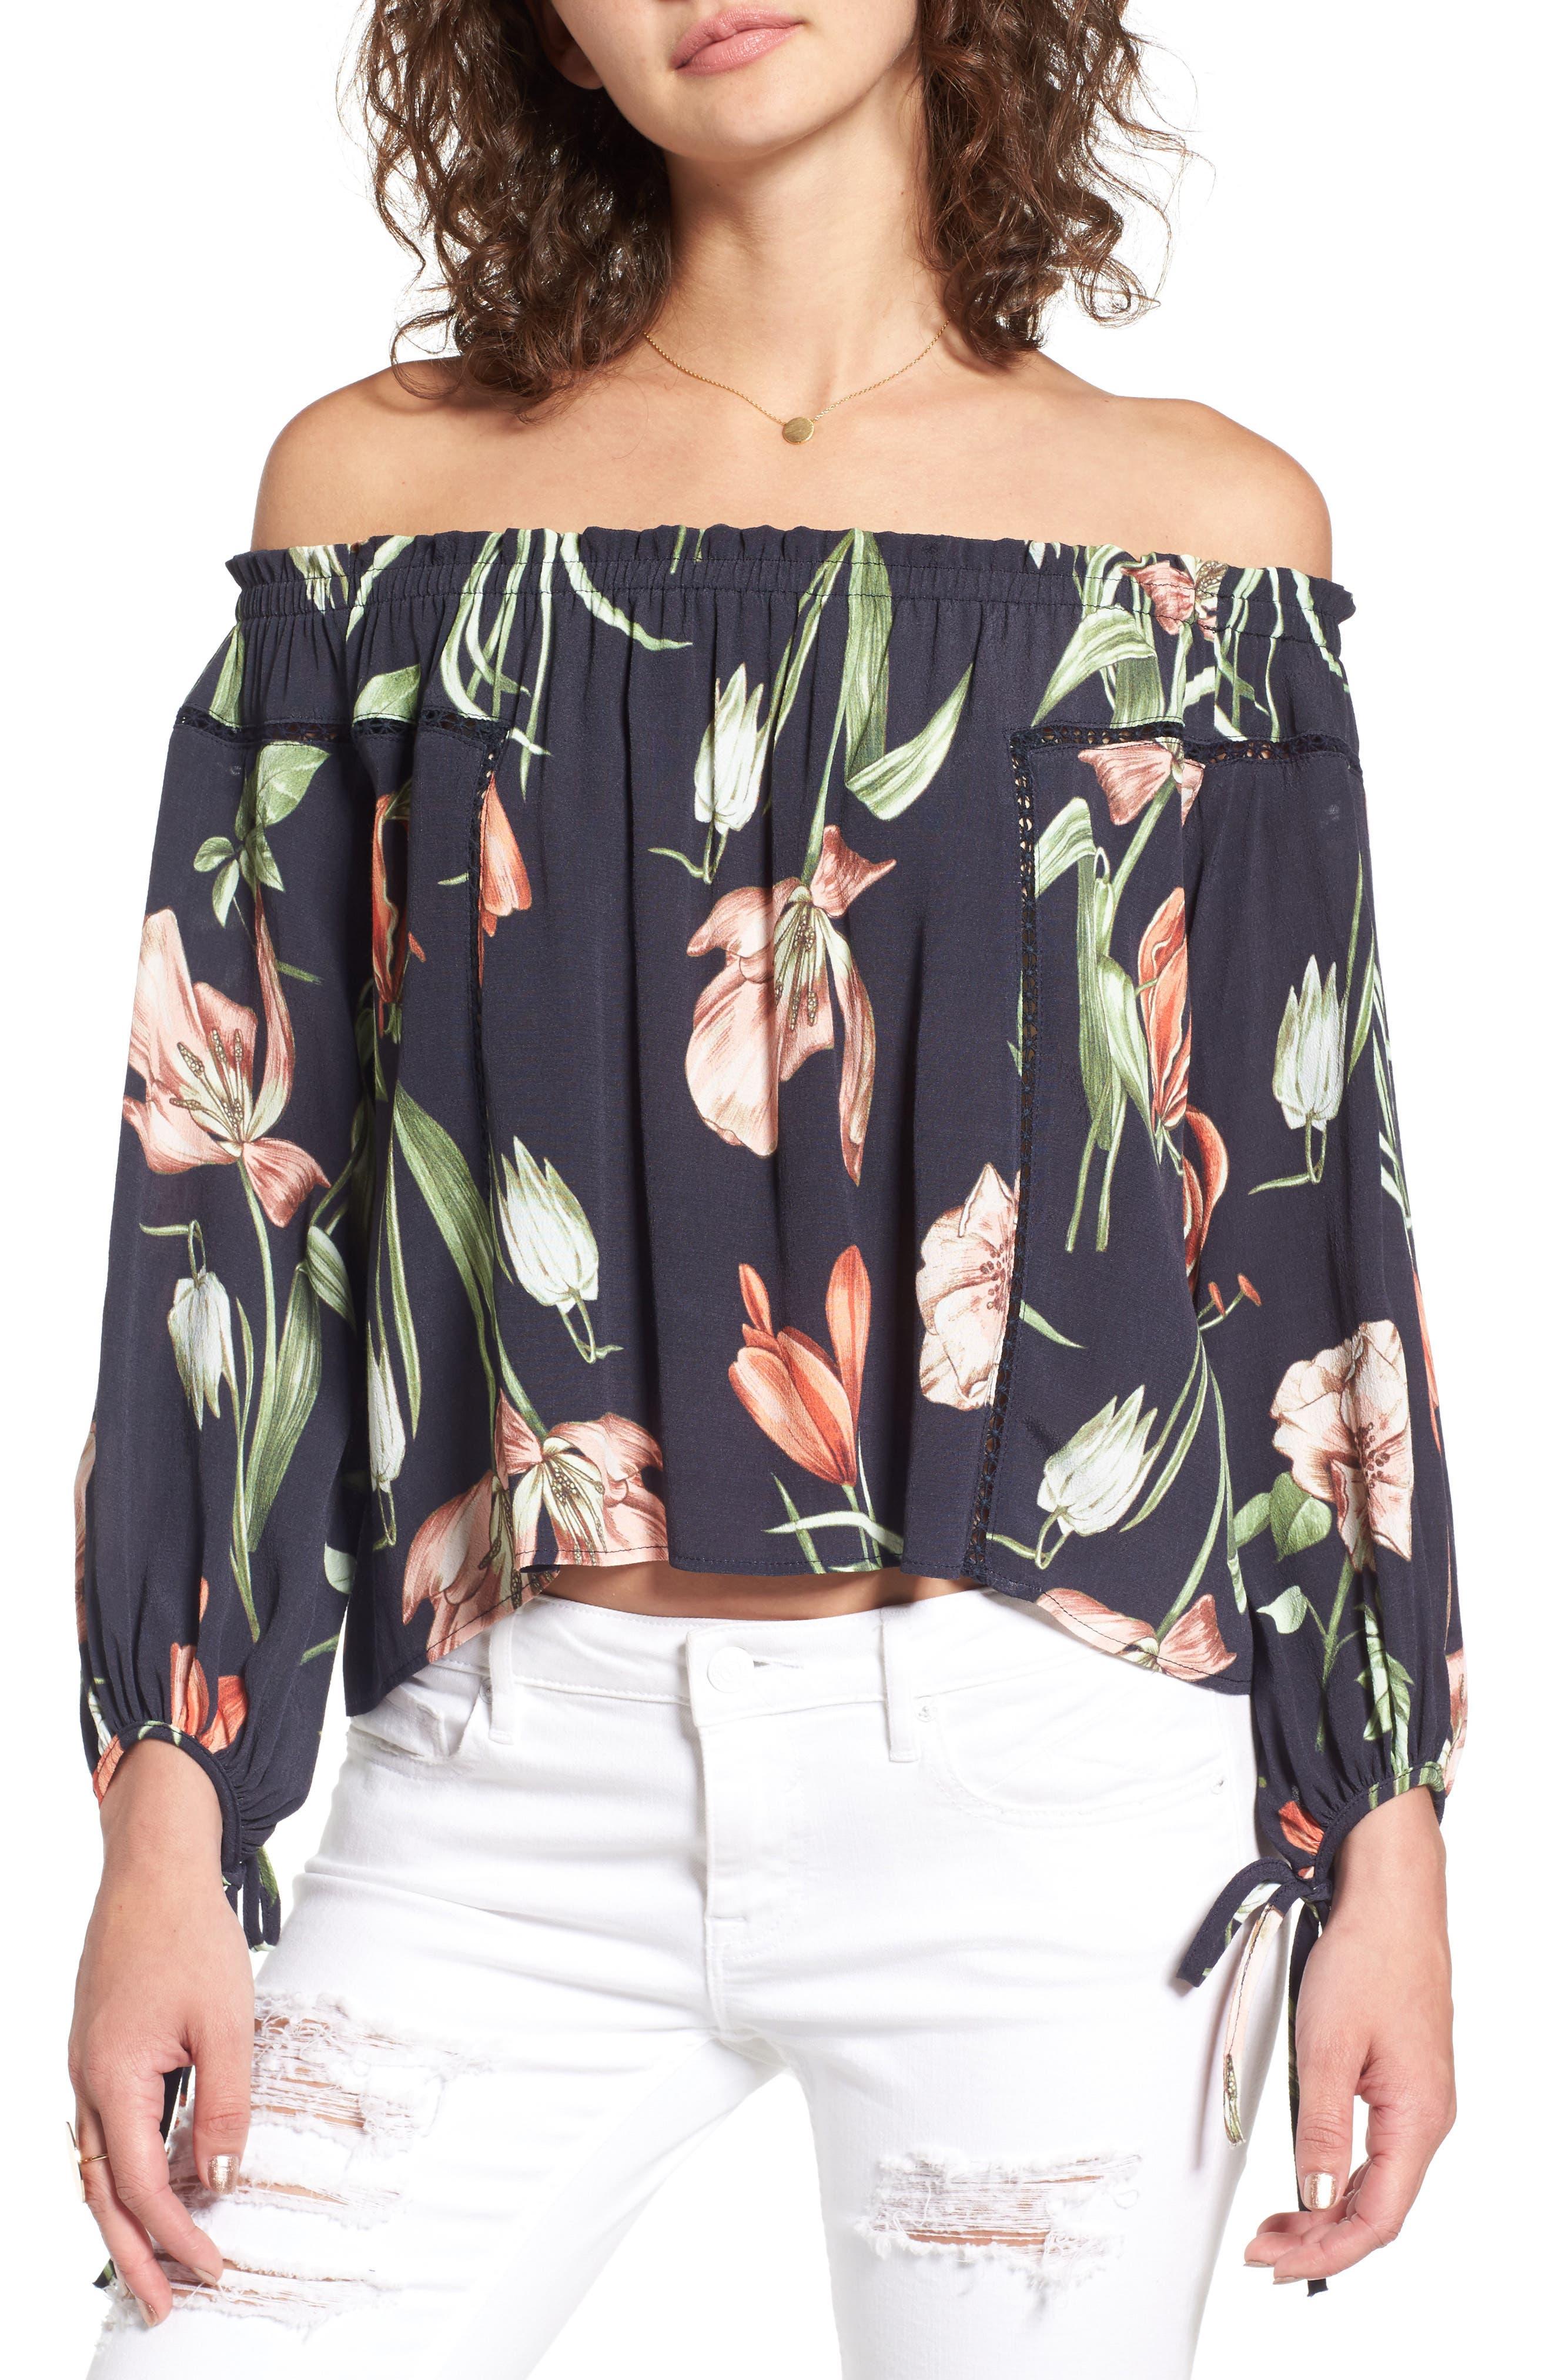 Chavelle Off the Shoulder Blouse,                         Main,                         color, Black Multi Floral